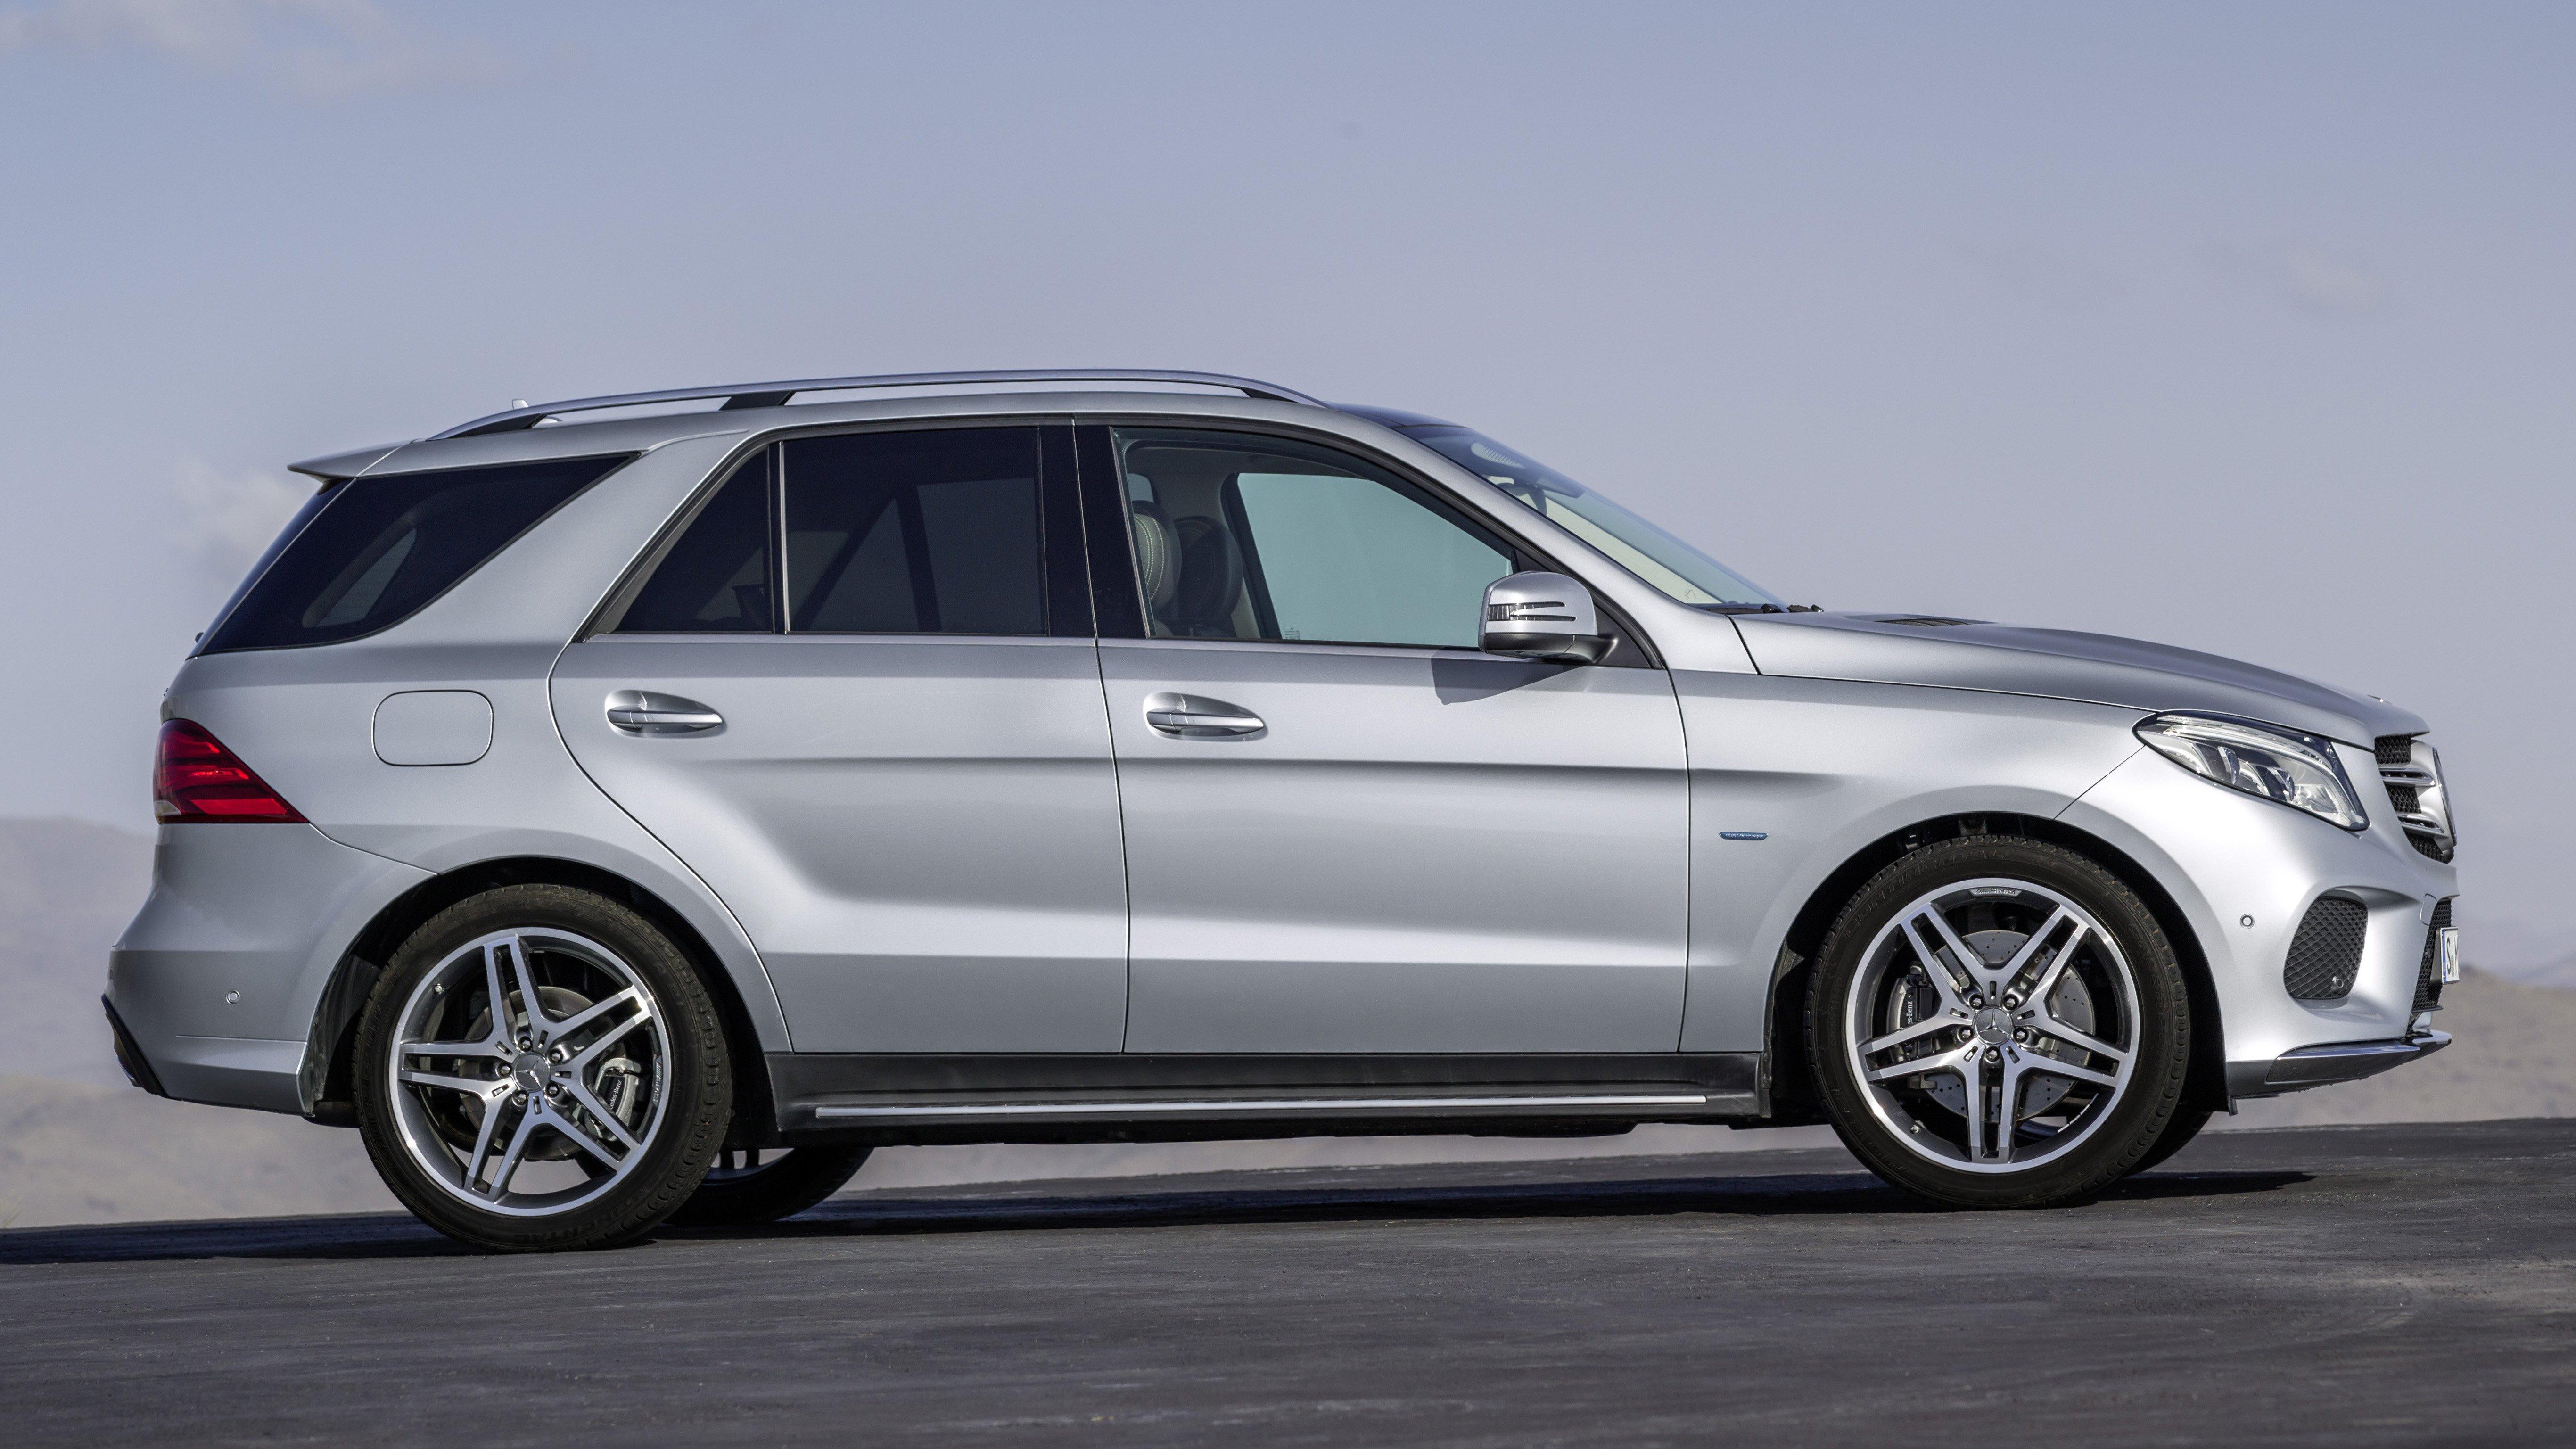 Mercedes benz gle class unveiled former m class gets new for Mercedes benz techs